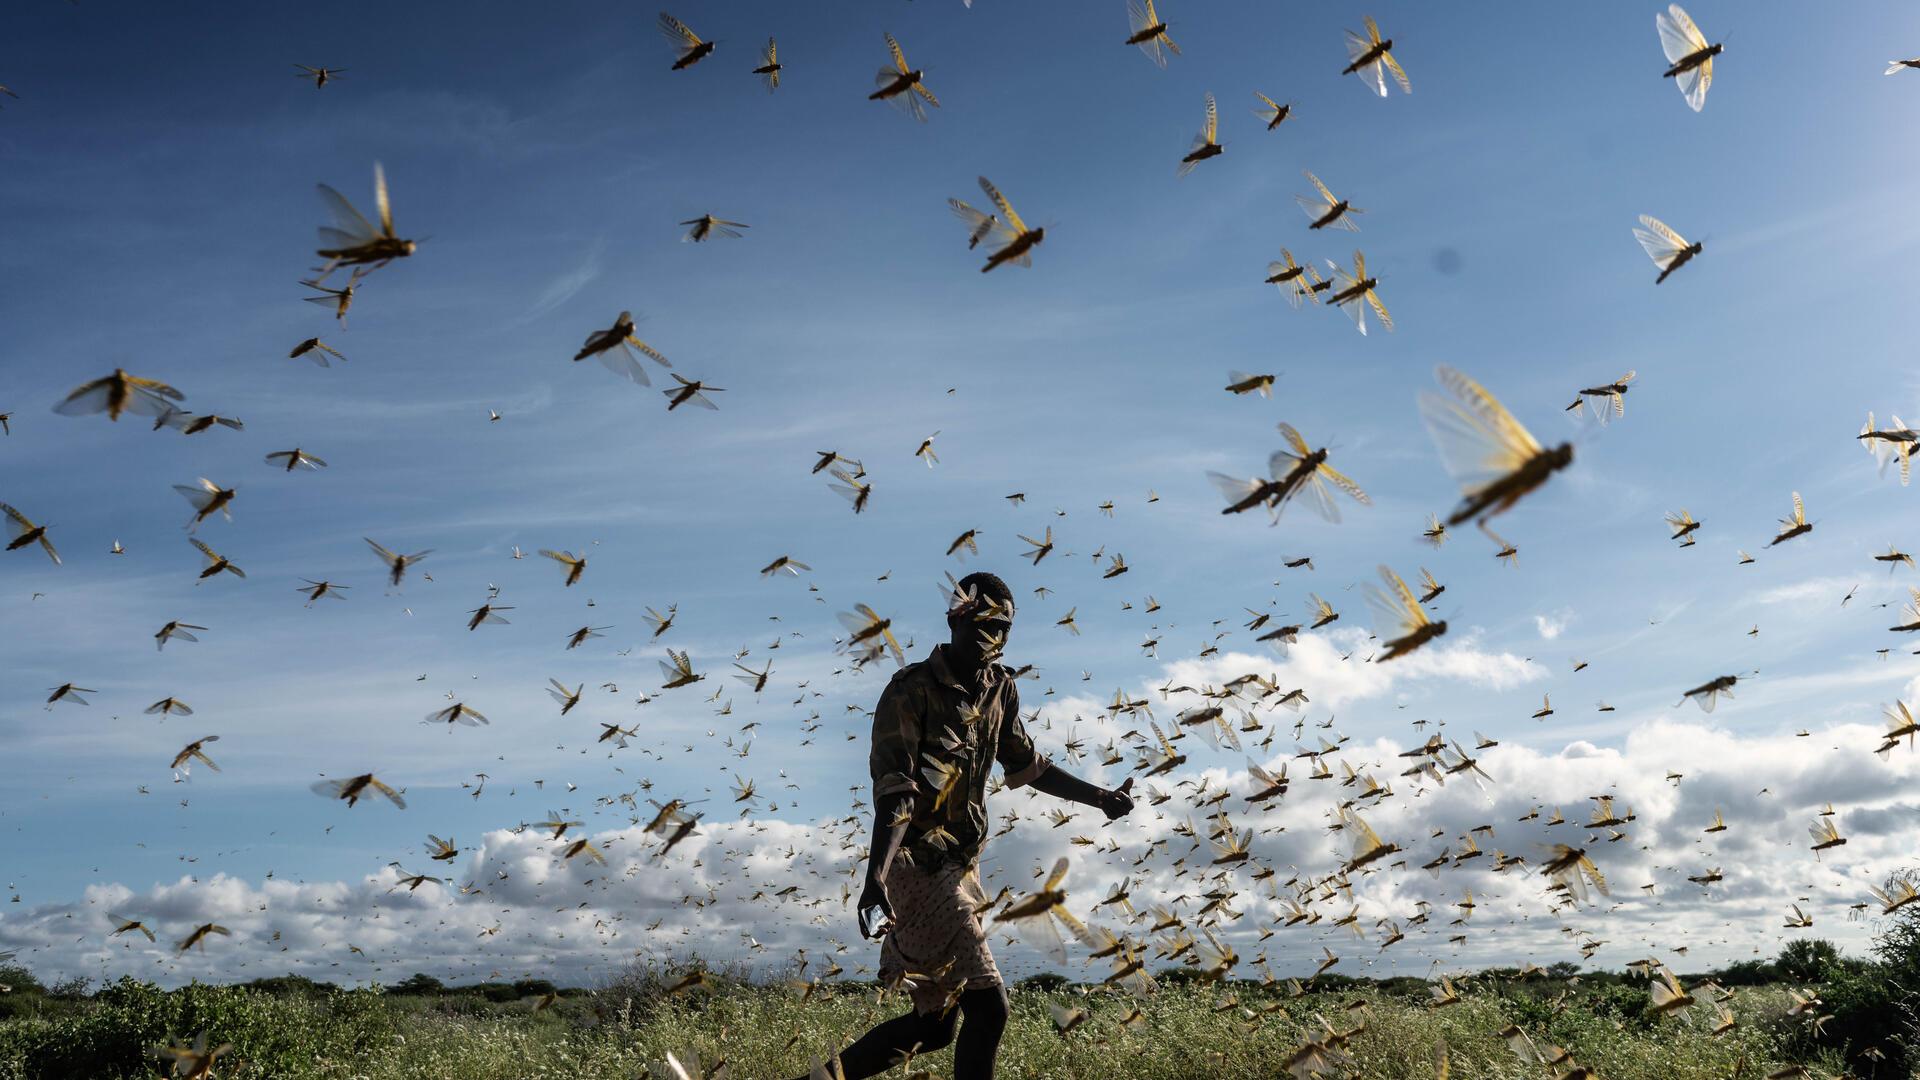 A man runs, chasing away a swarm of desert locusts early in the morning in Samburu County, Kenya.